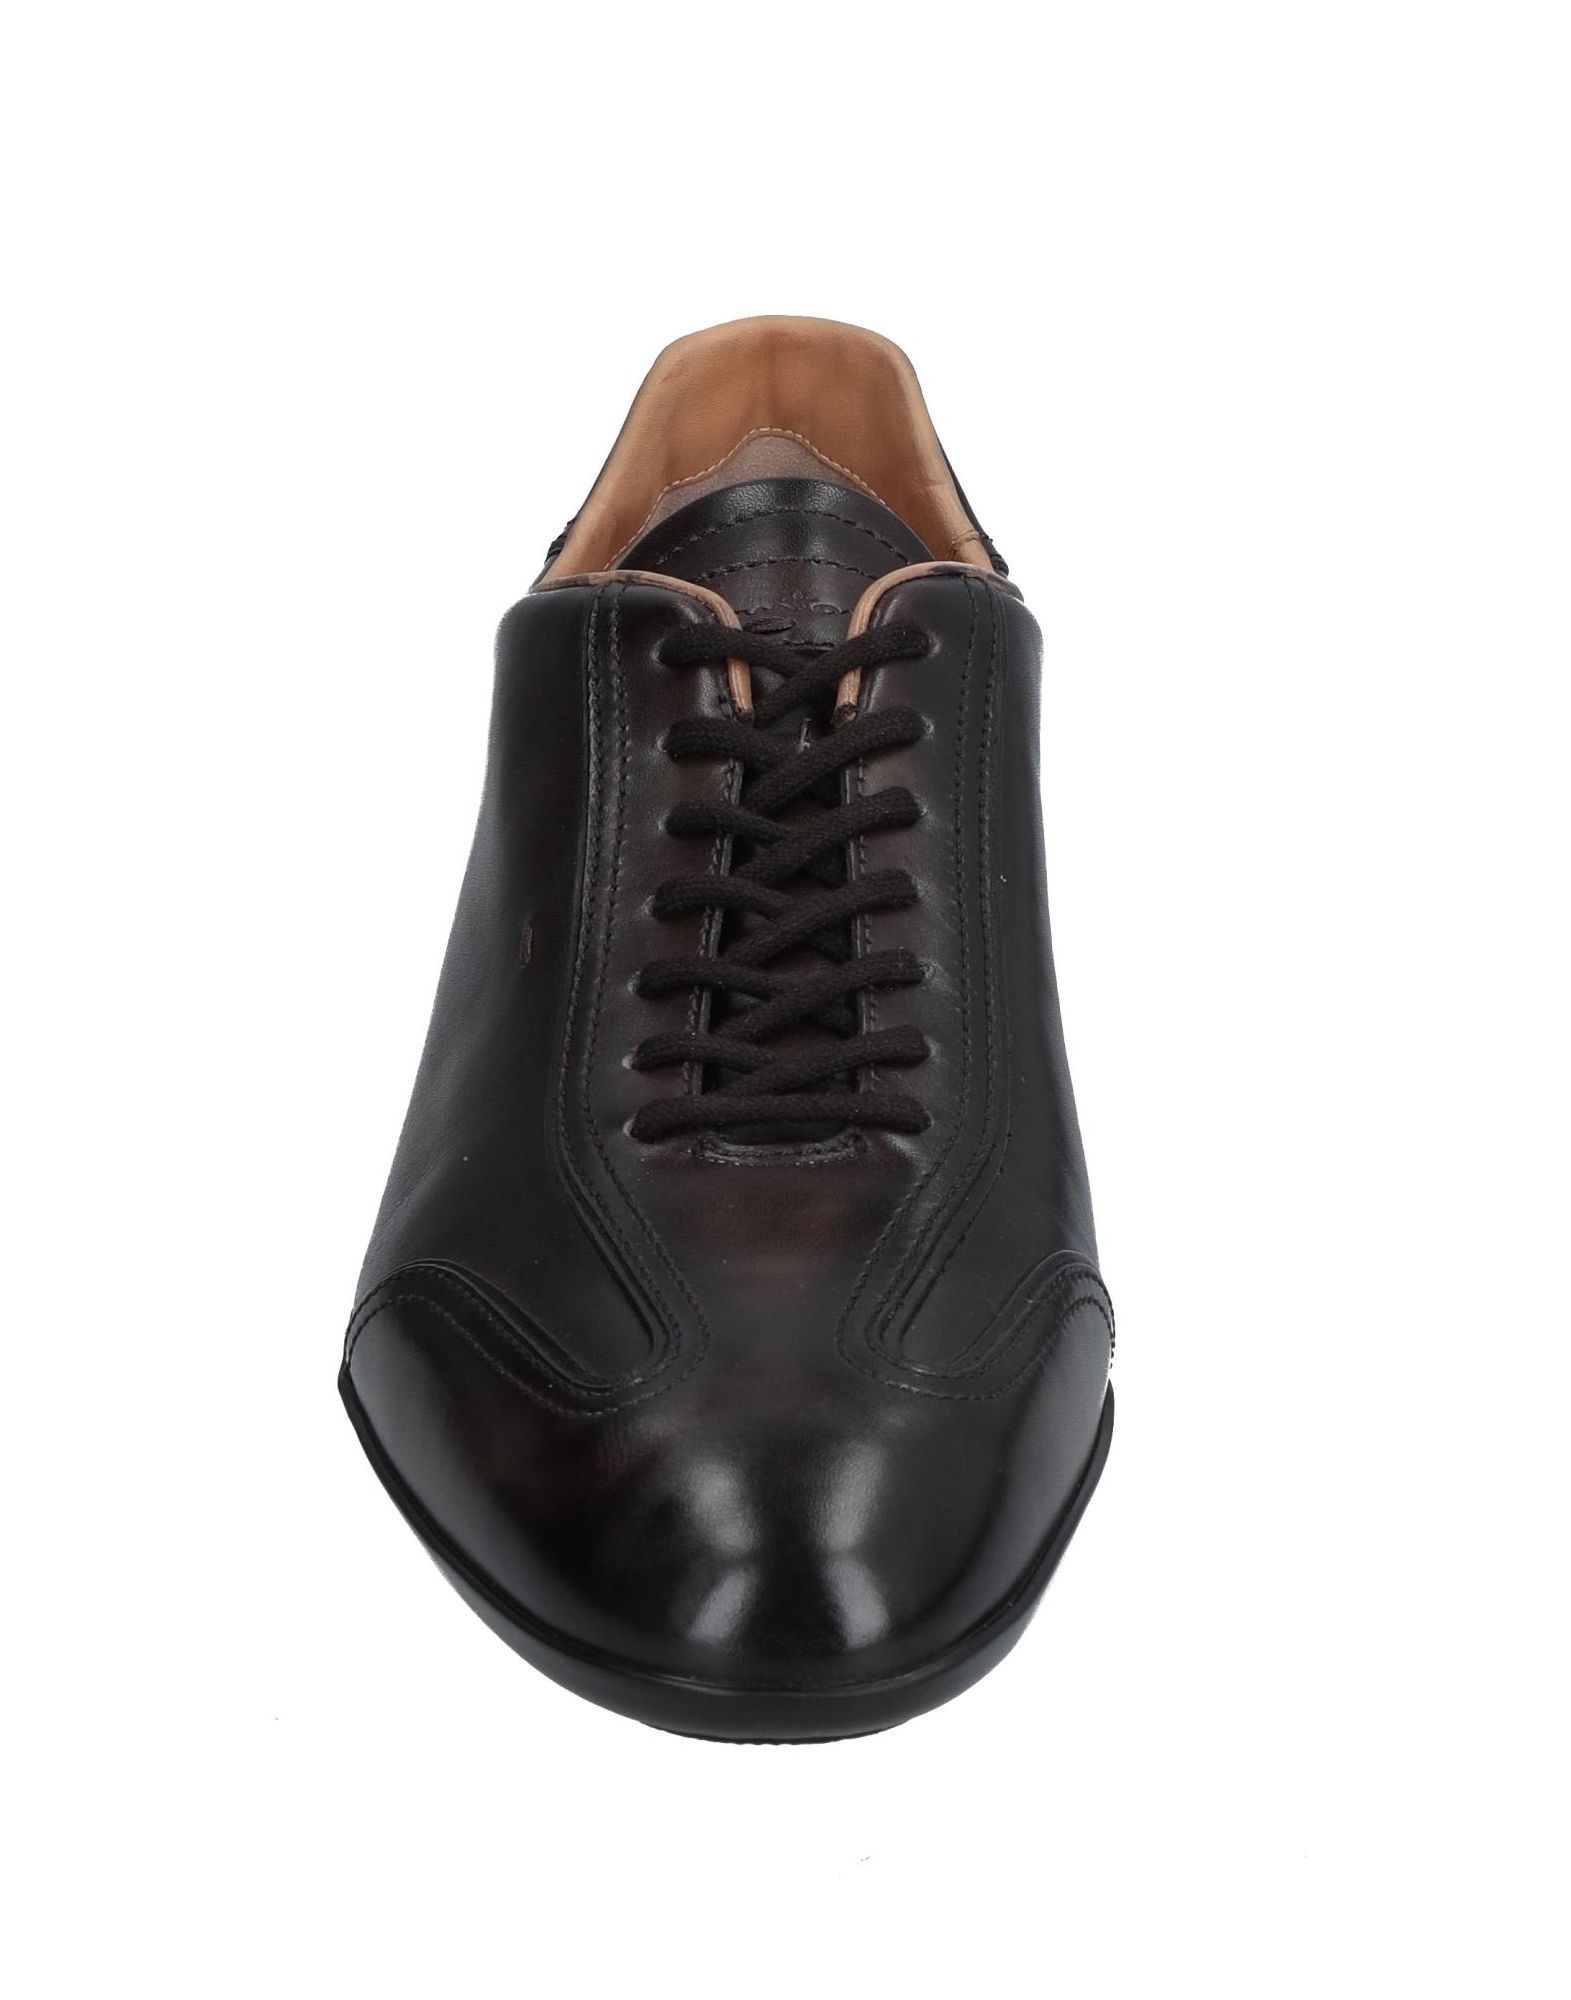 Santoni Sneakers Herren  Schuhe 11541989FA Gute Qualität beliebte Schuhe  07a6da